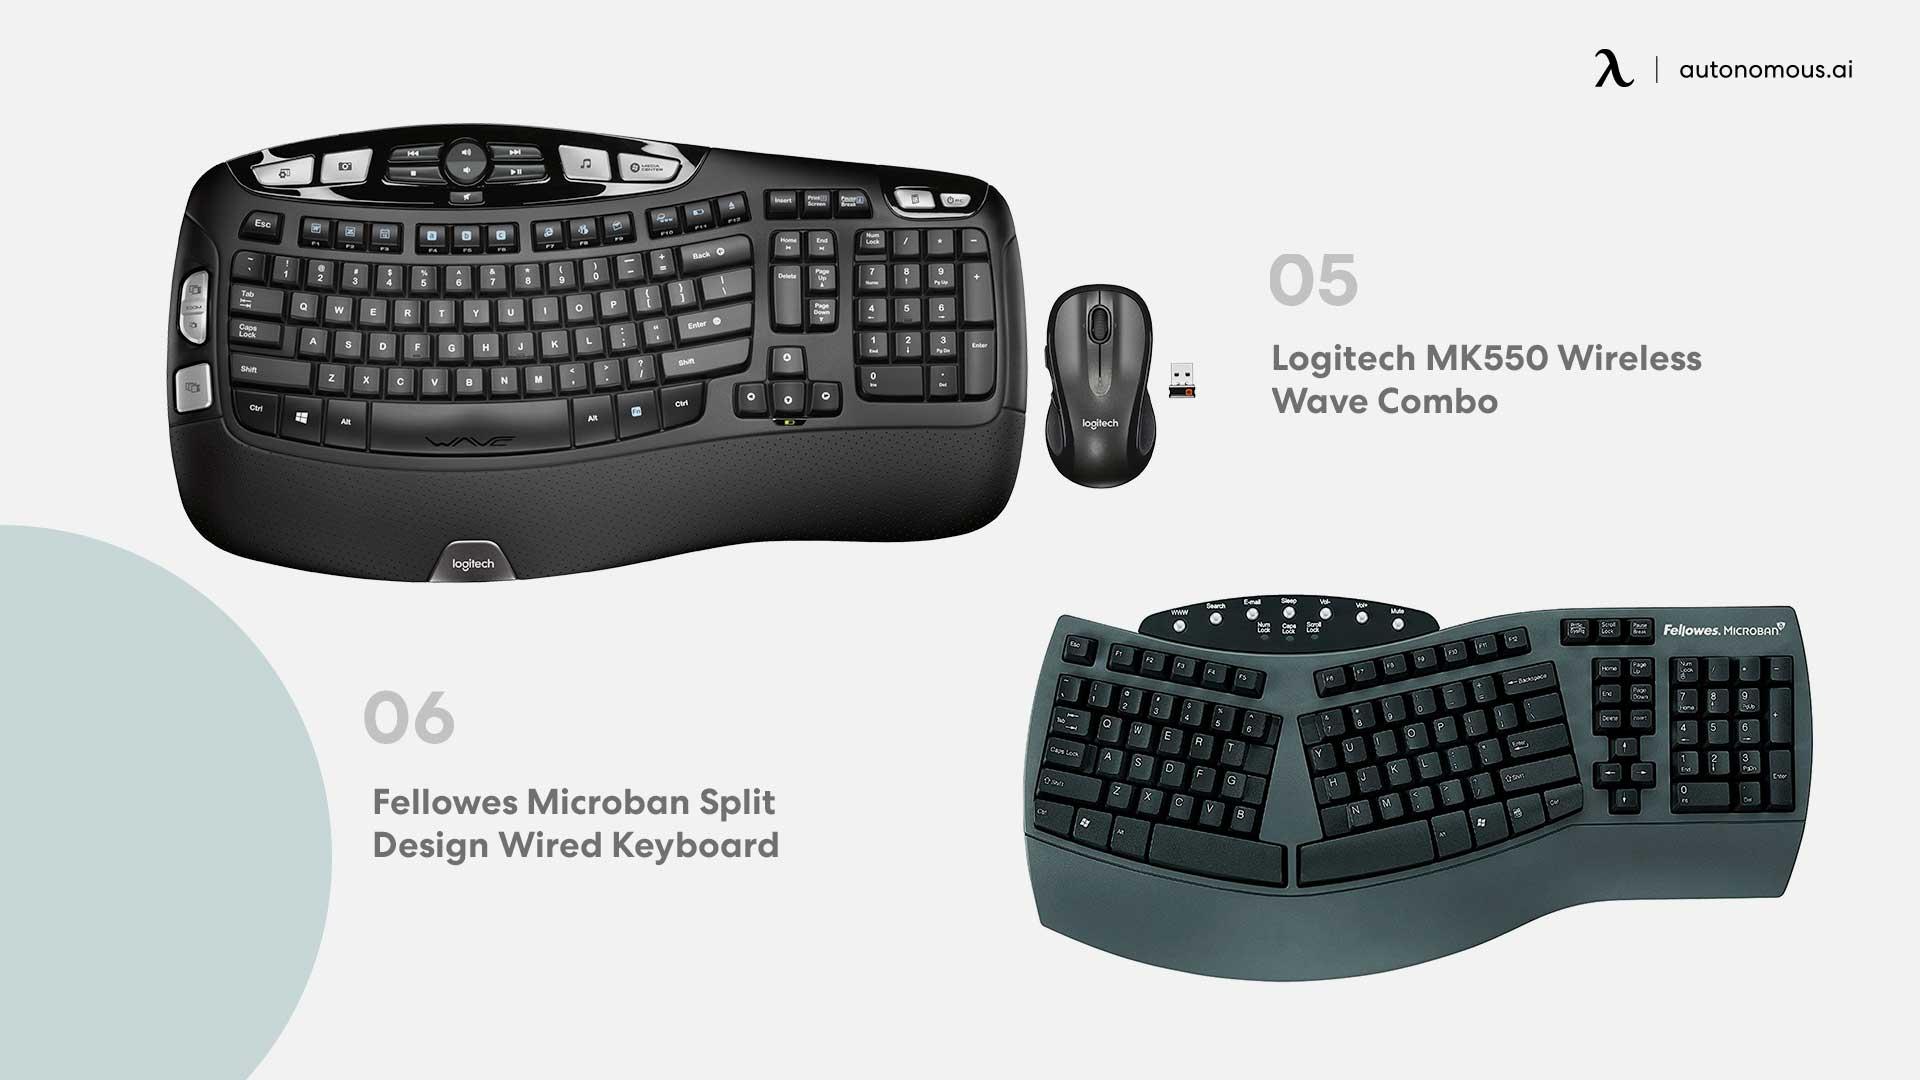 Photo of logitech MK550 and Fellowes Microban split design